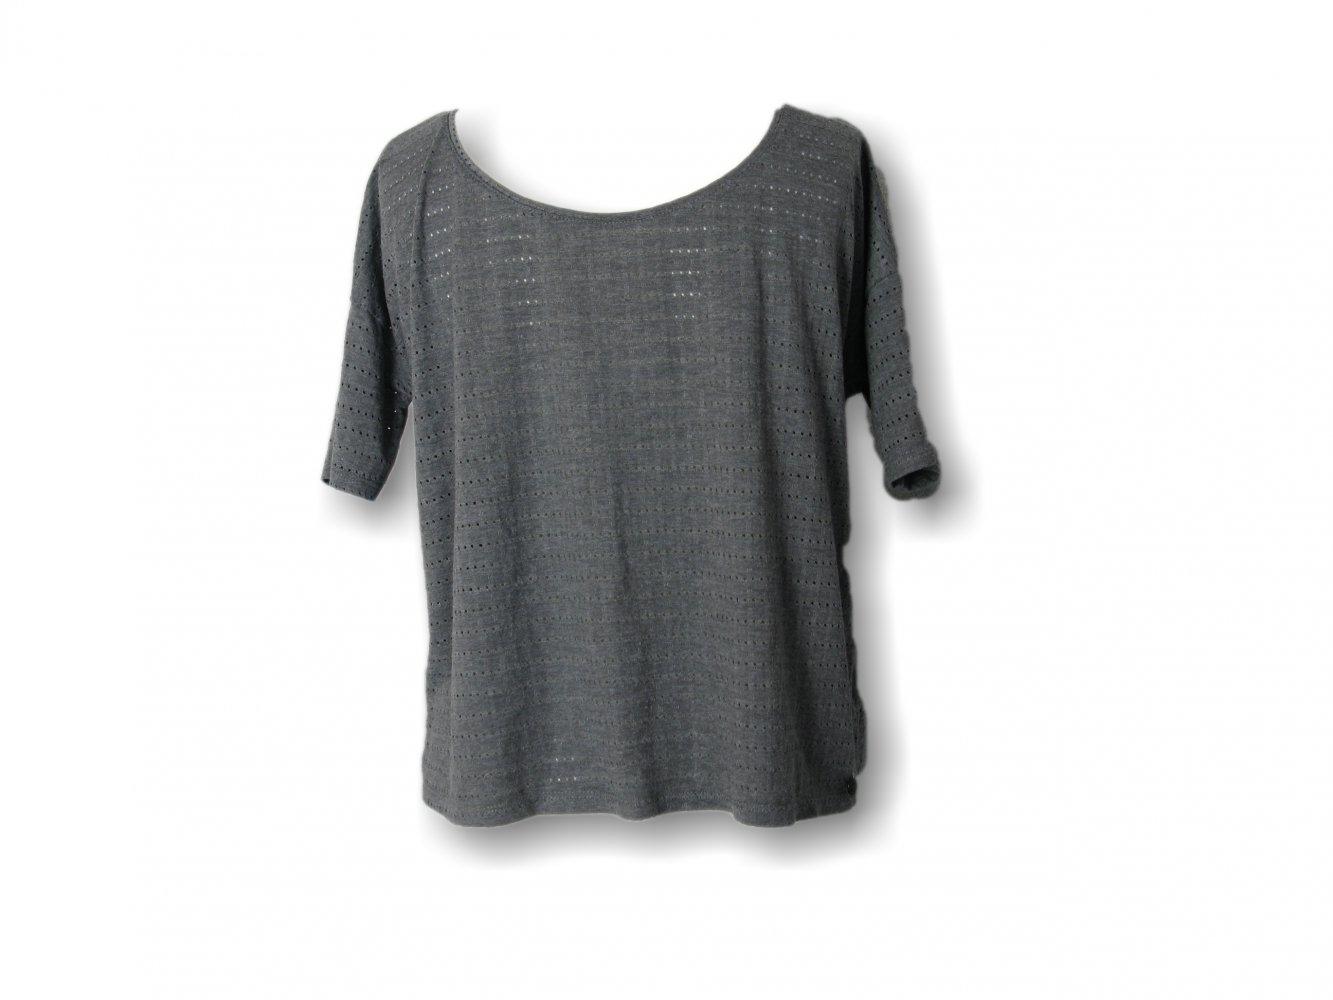 Tom Tailor Shirt, Gr. L, grau, leicht und modern    Kleiderkorb.de f7abcc7abf